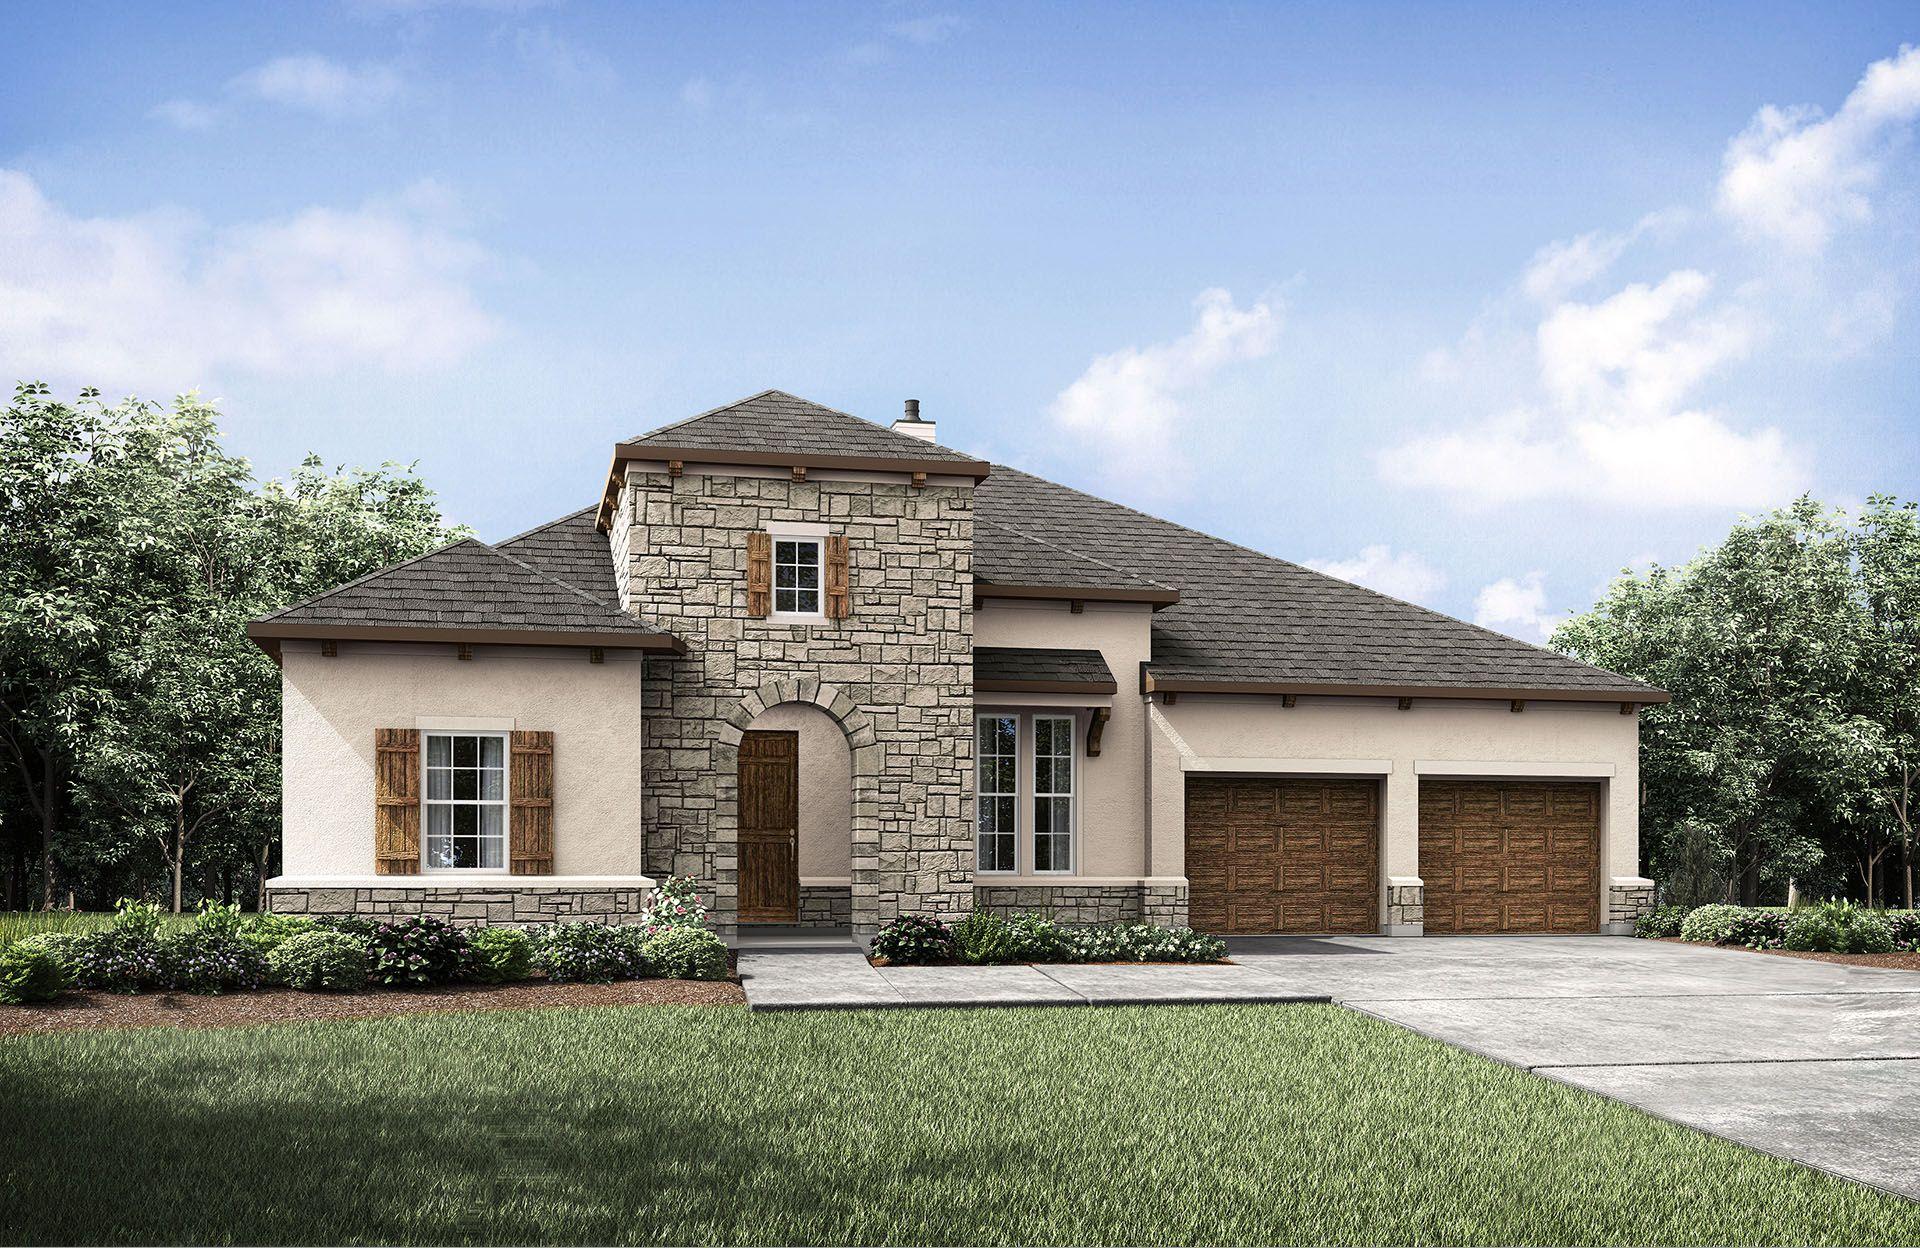 Single Family for Sale at Cimarron Hills - Tinsley 307 Flint Ridge Georgetown, Texas 78628 United States